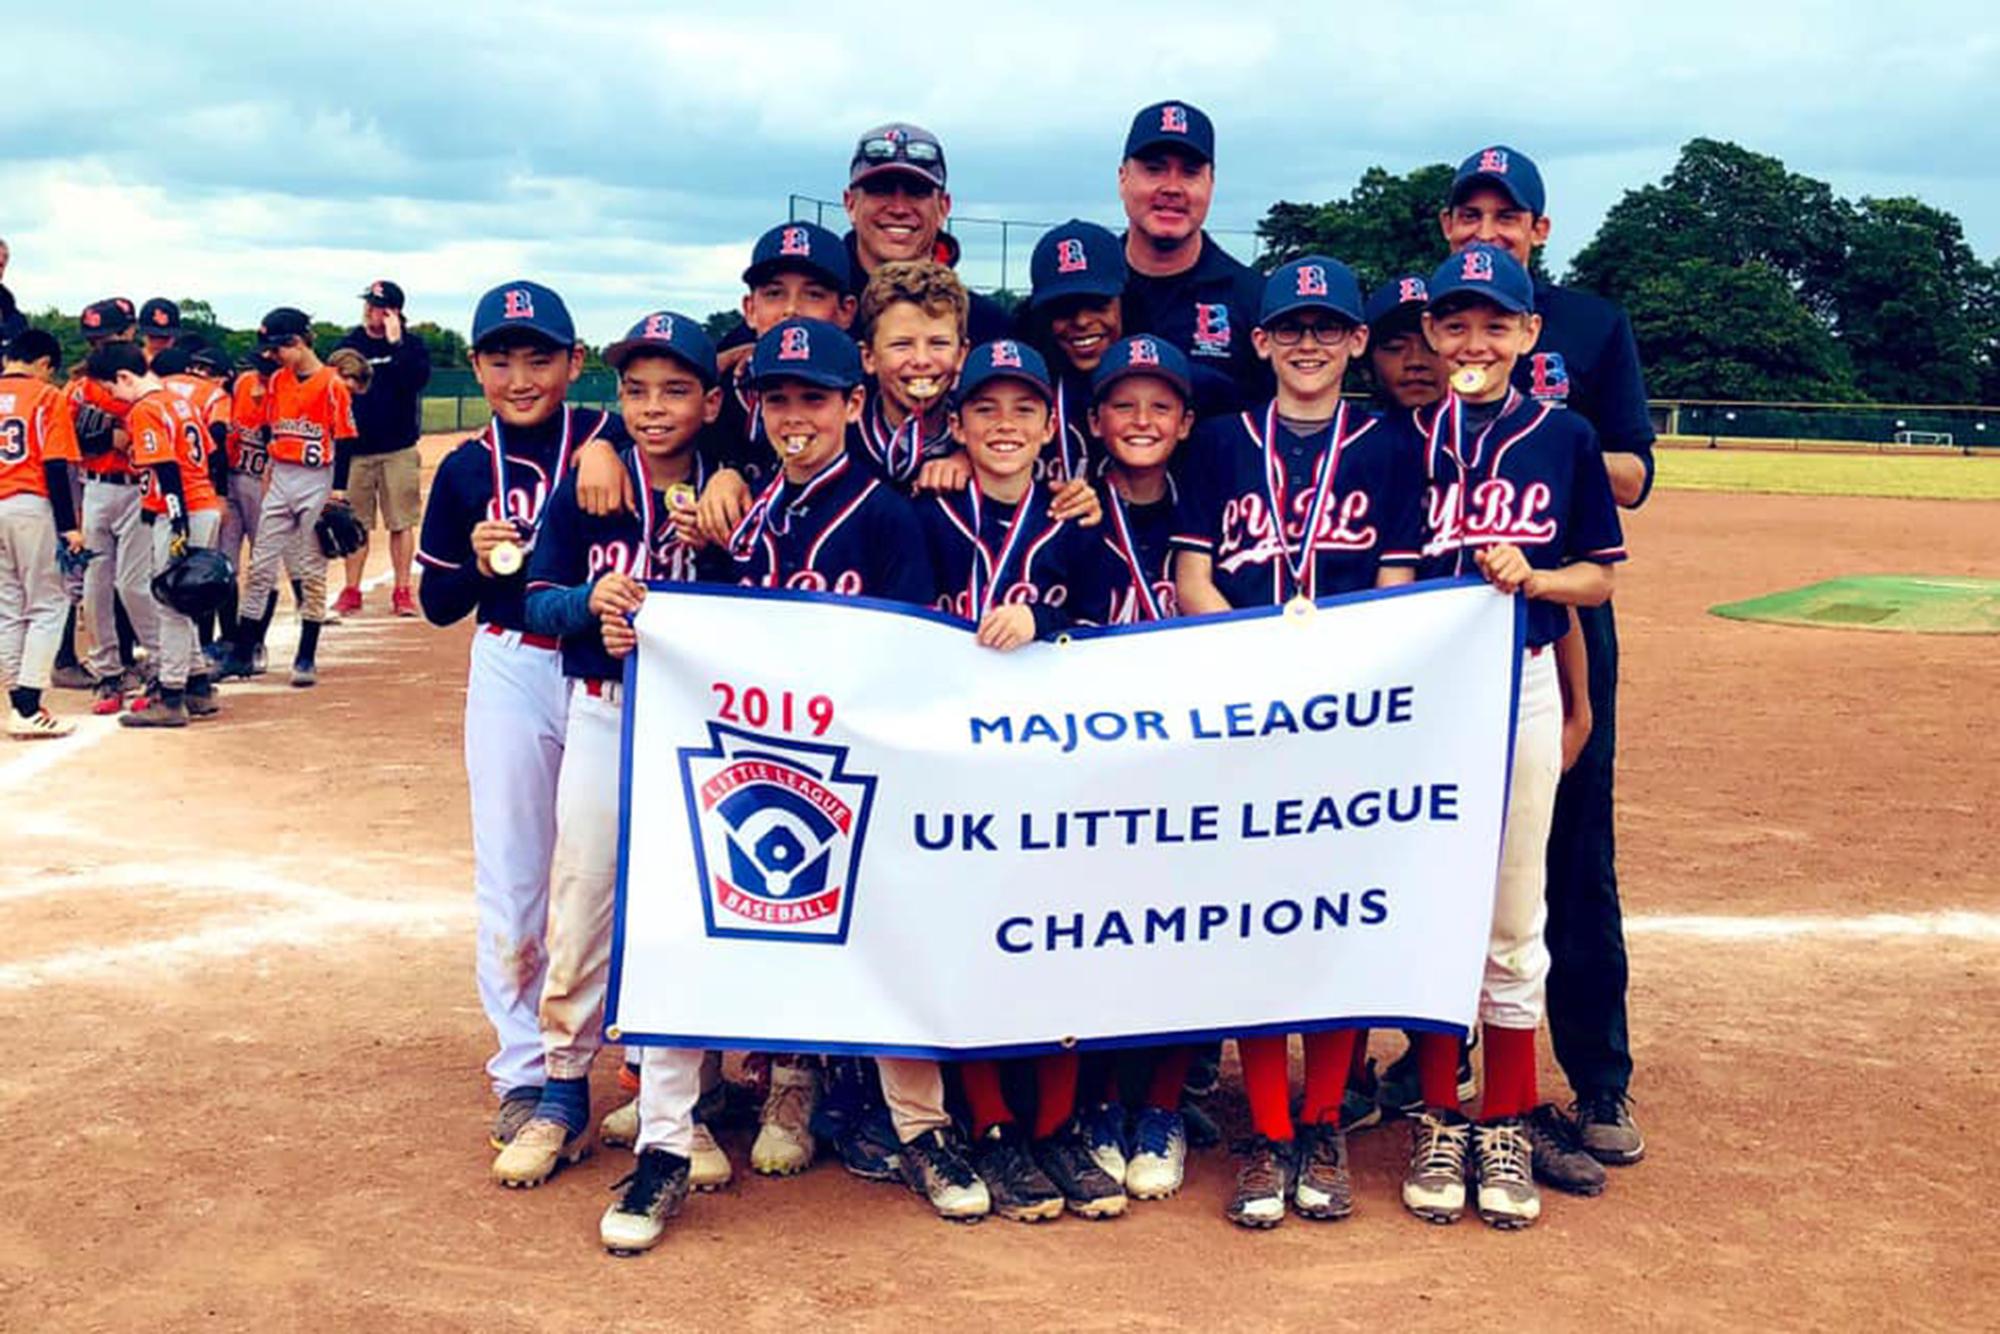 London Youth Baseball League wins 2019 UK National Qualifier